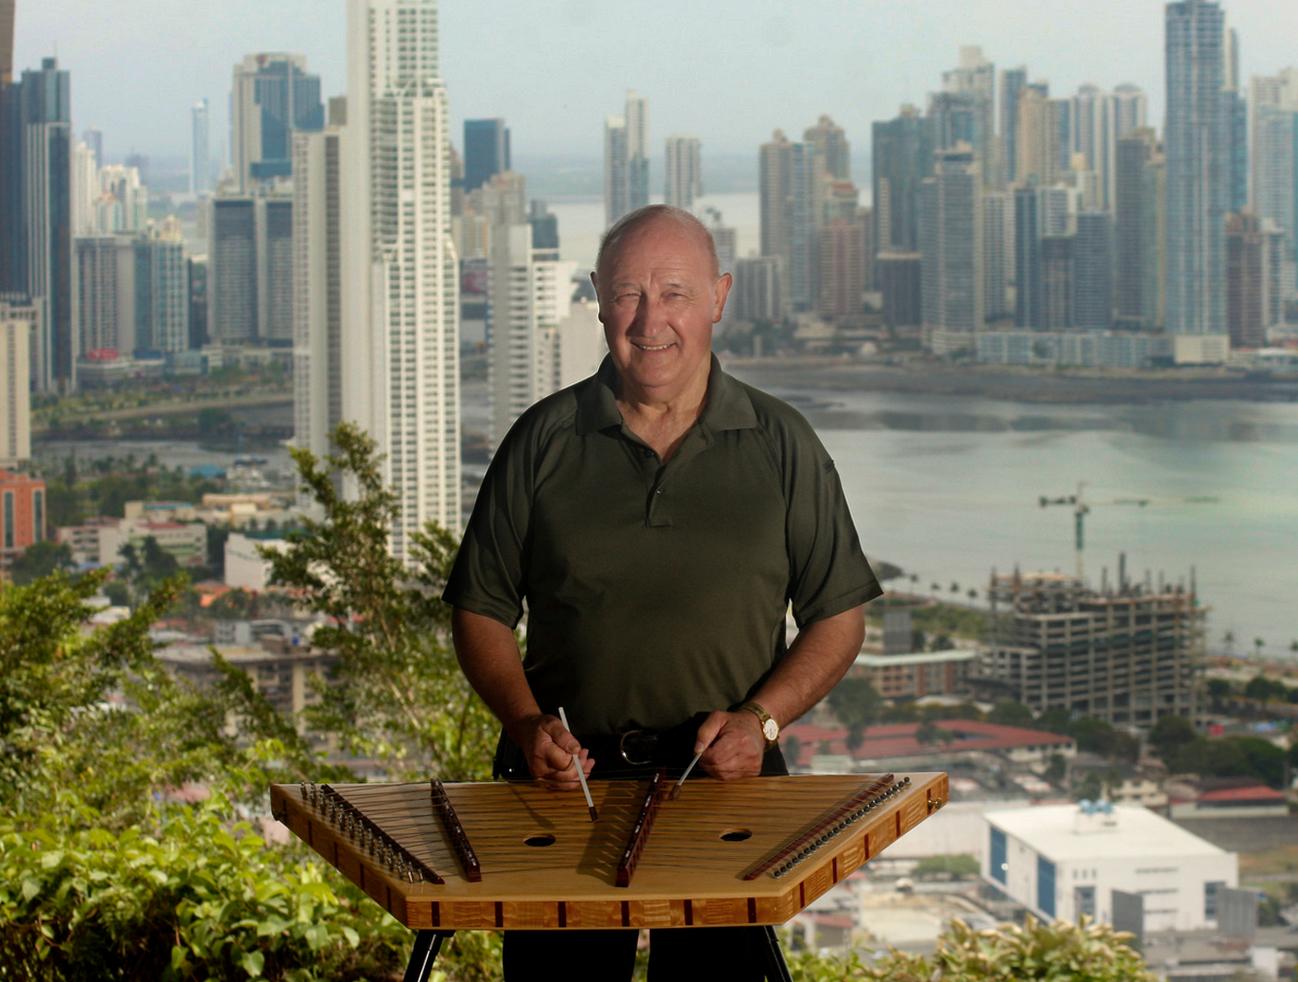 Bill in Panama City, Panama 2013